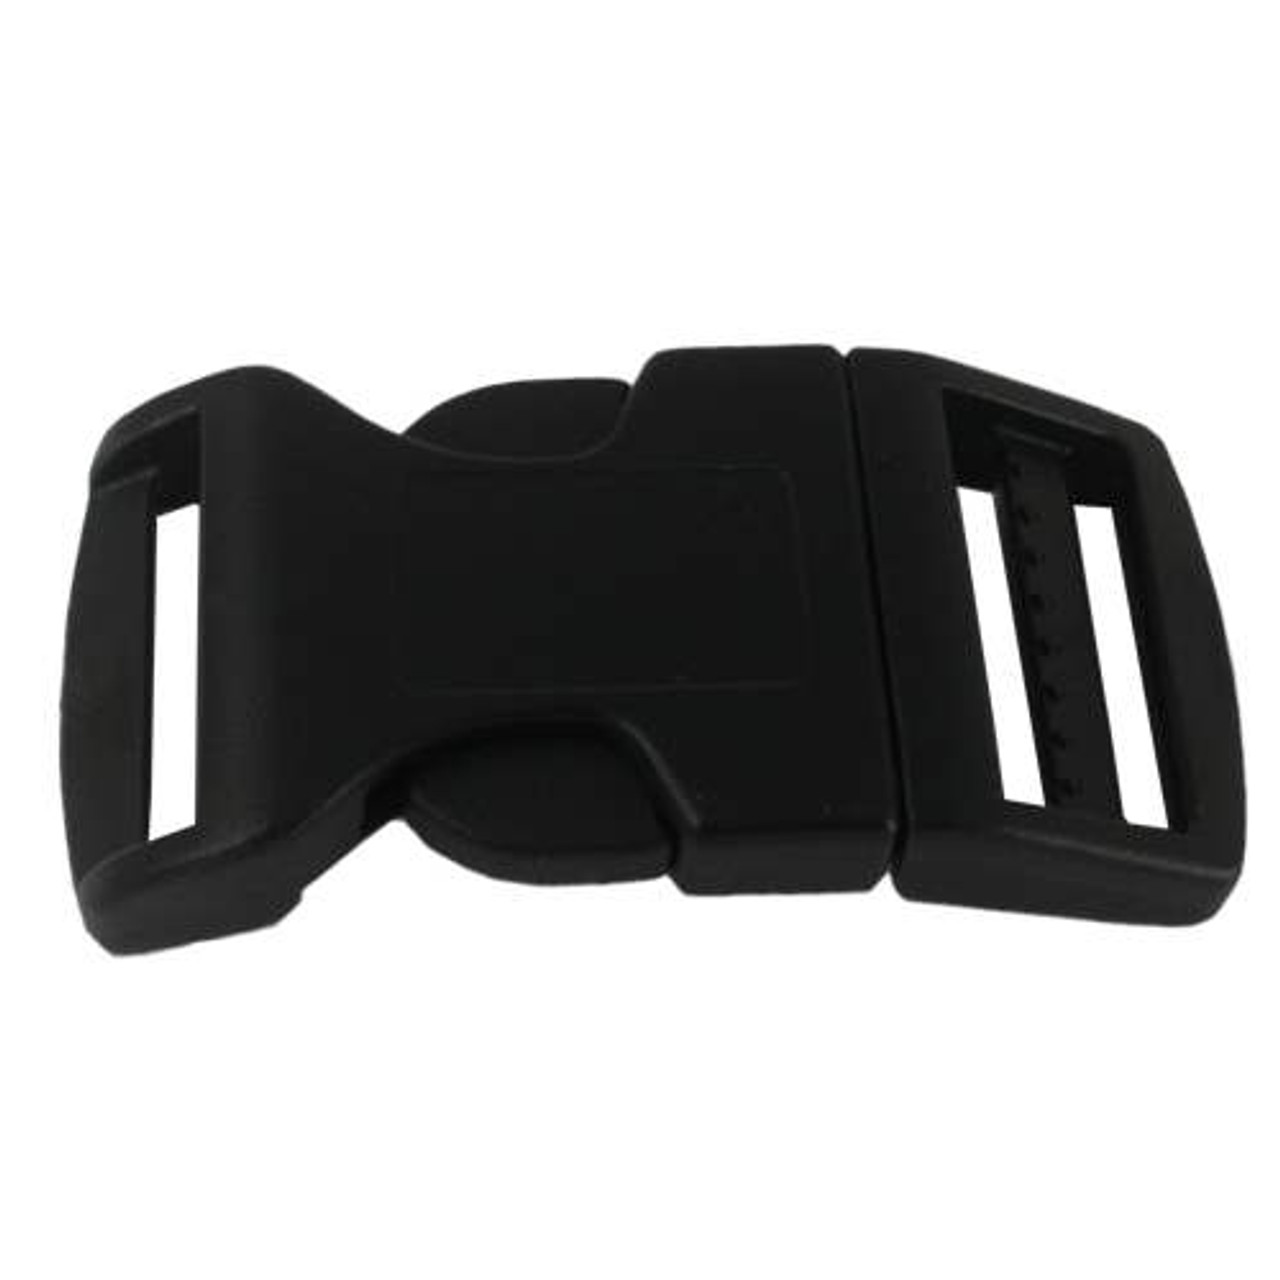 "20-1//2/"" Side Release Contoured Plastic Buckles for Paracord Bracelets Black"